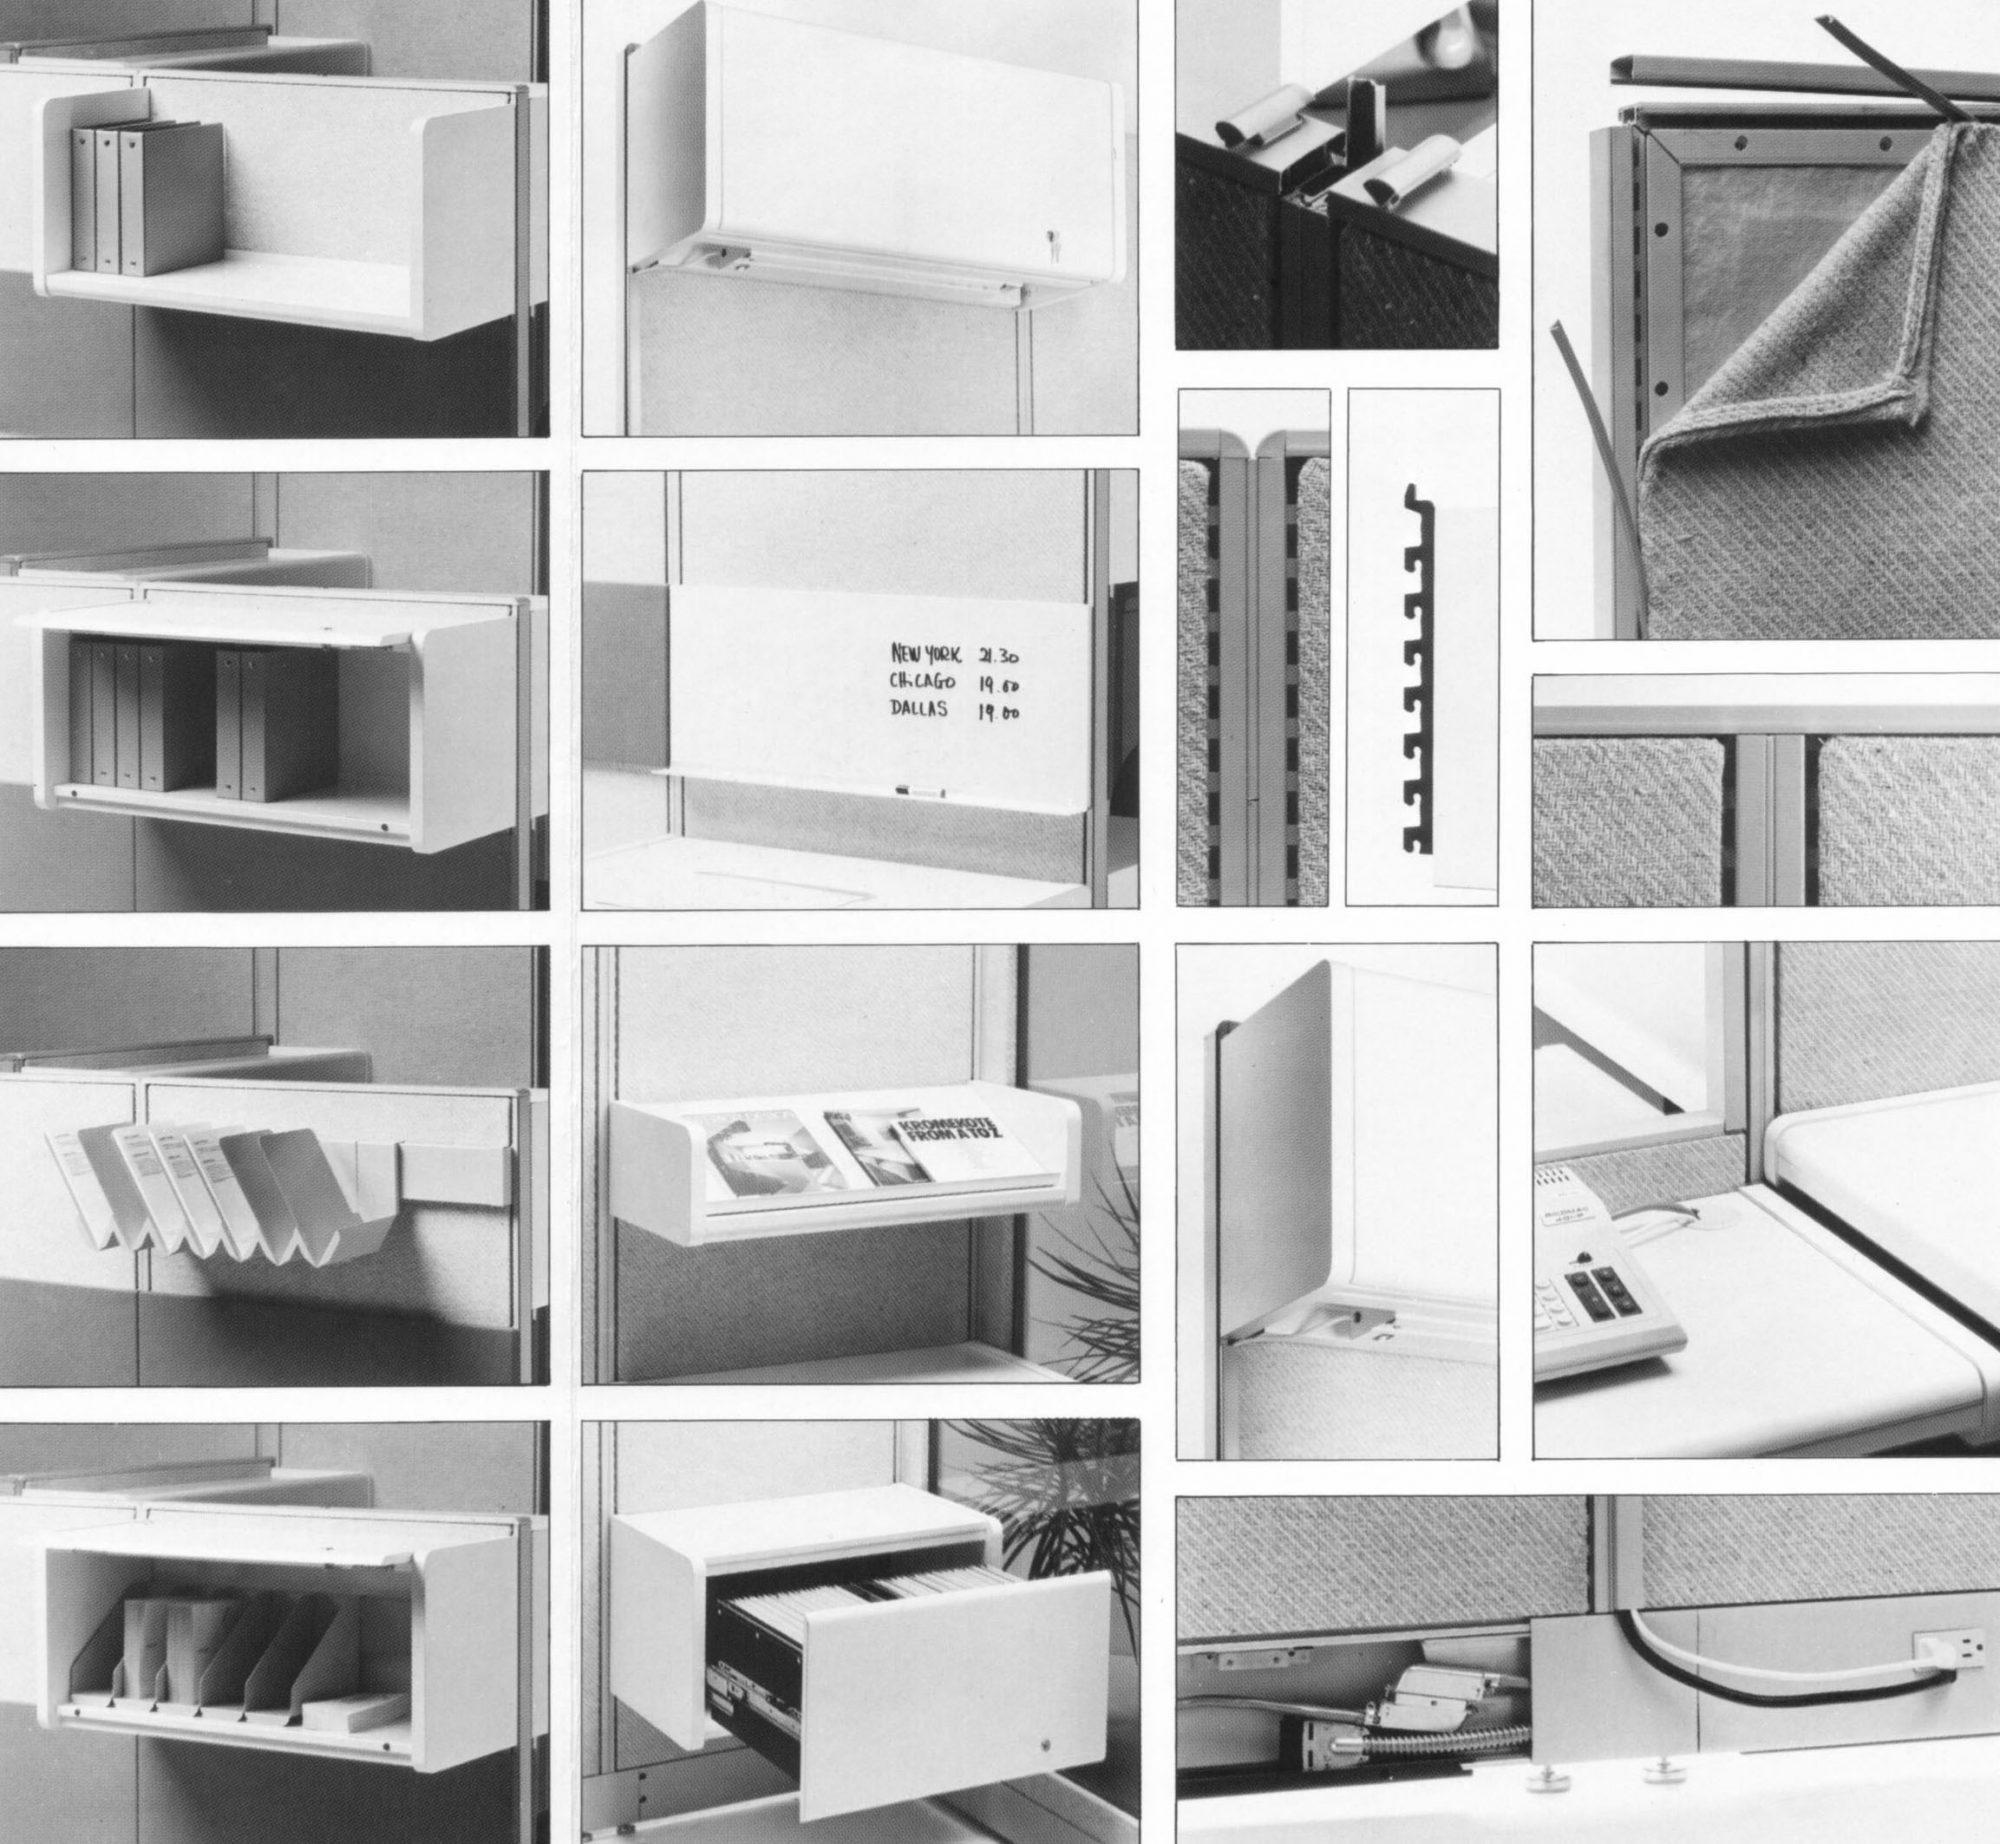 Mobilier de bureau luc bergeron design - Mobilier bureau montreal ...